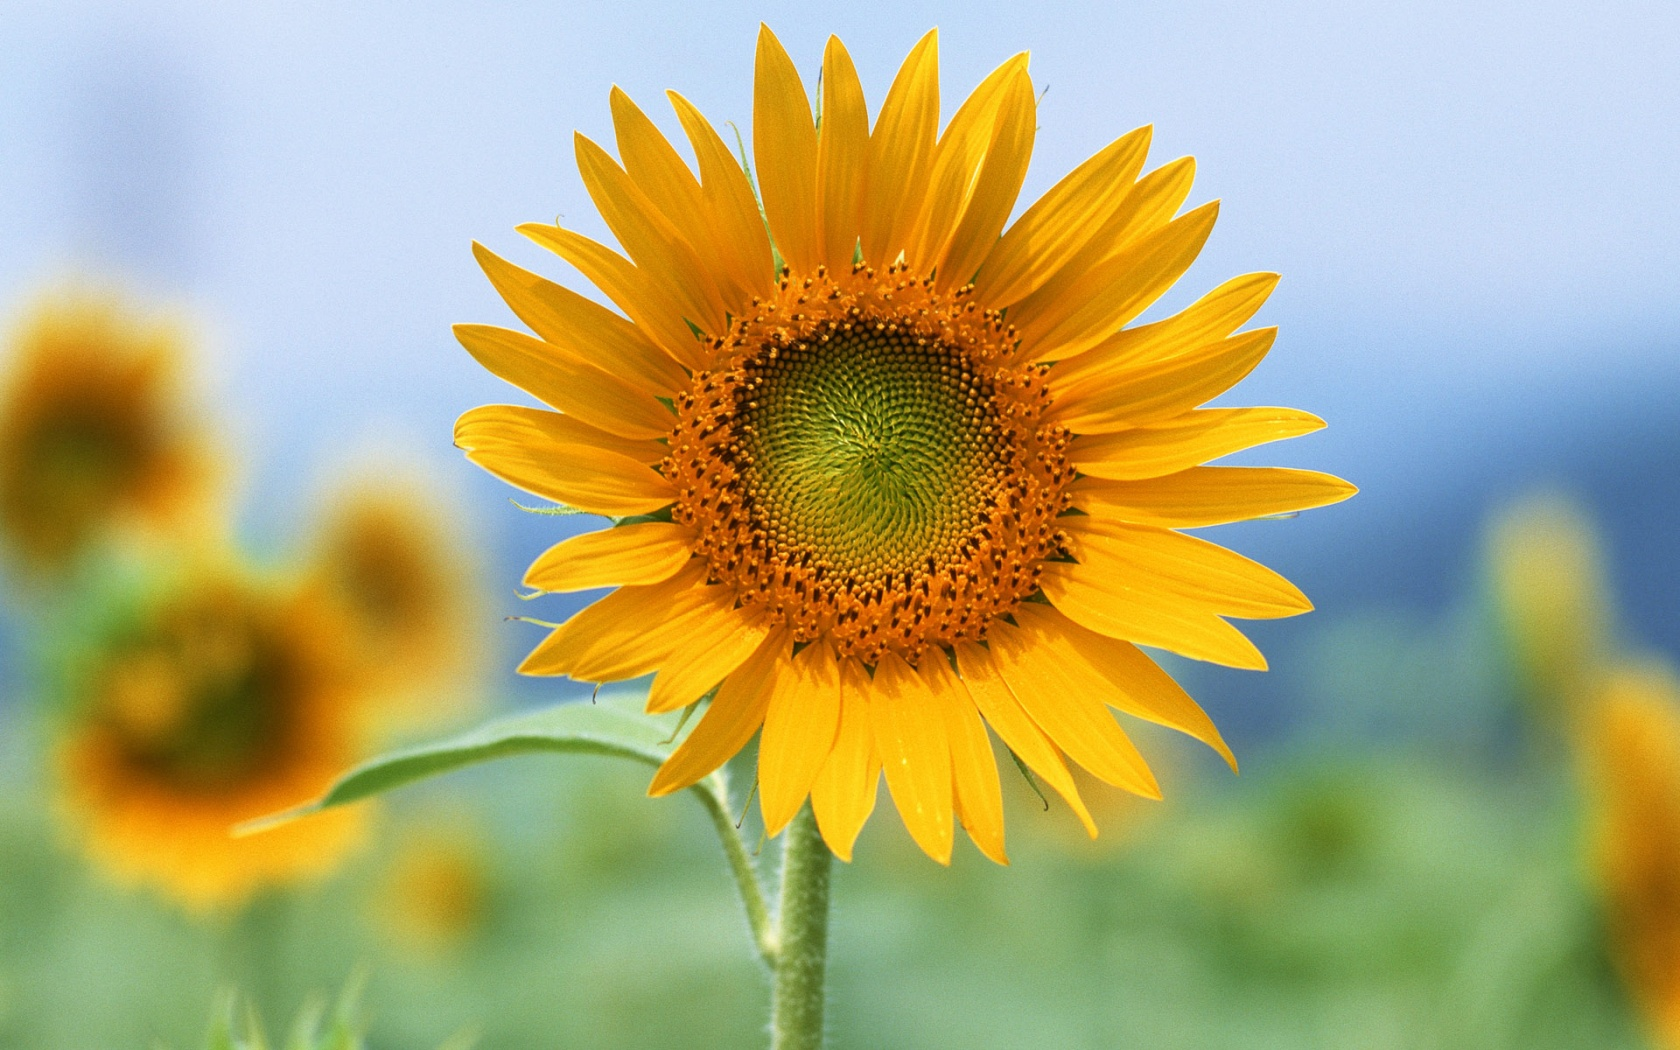 عکس گل آفتاب گردون